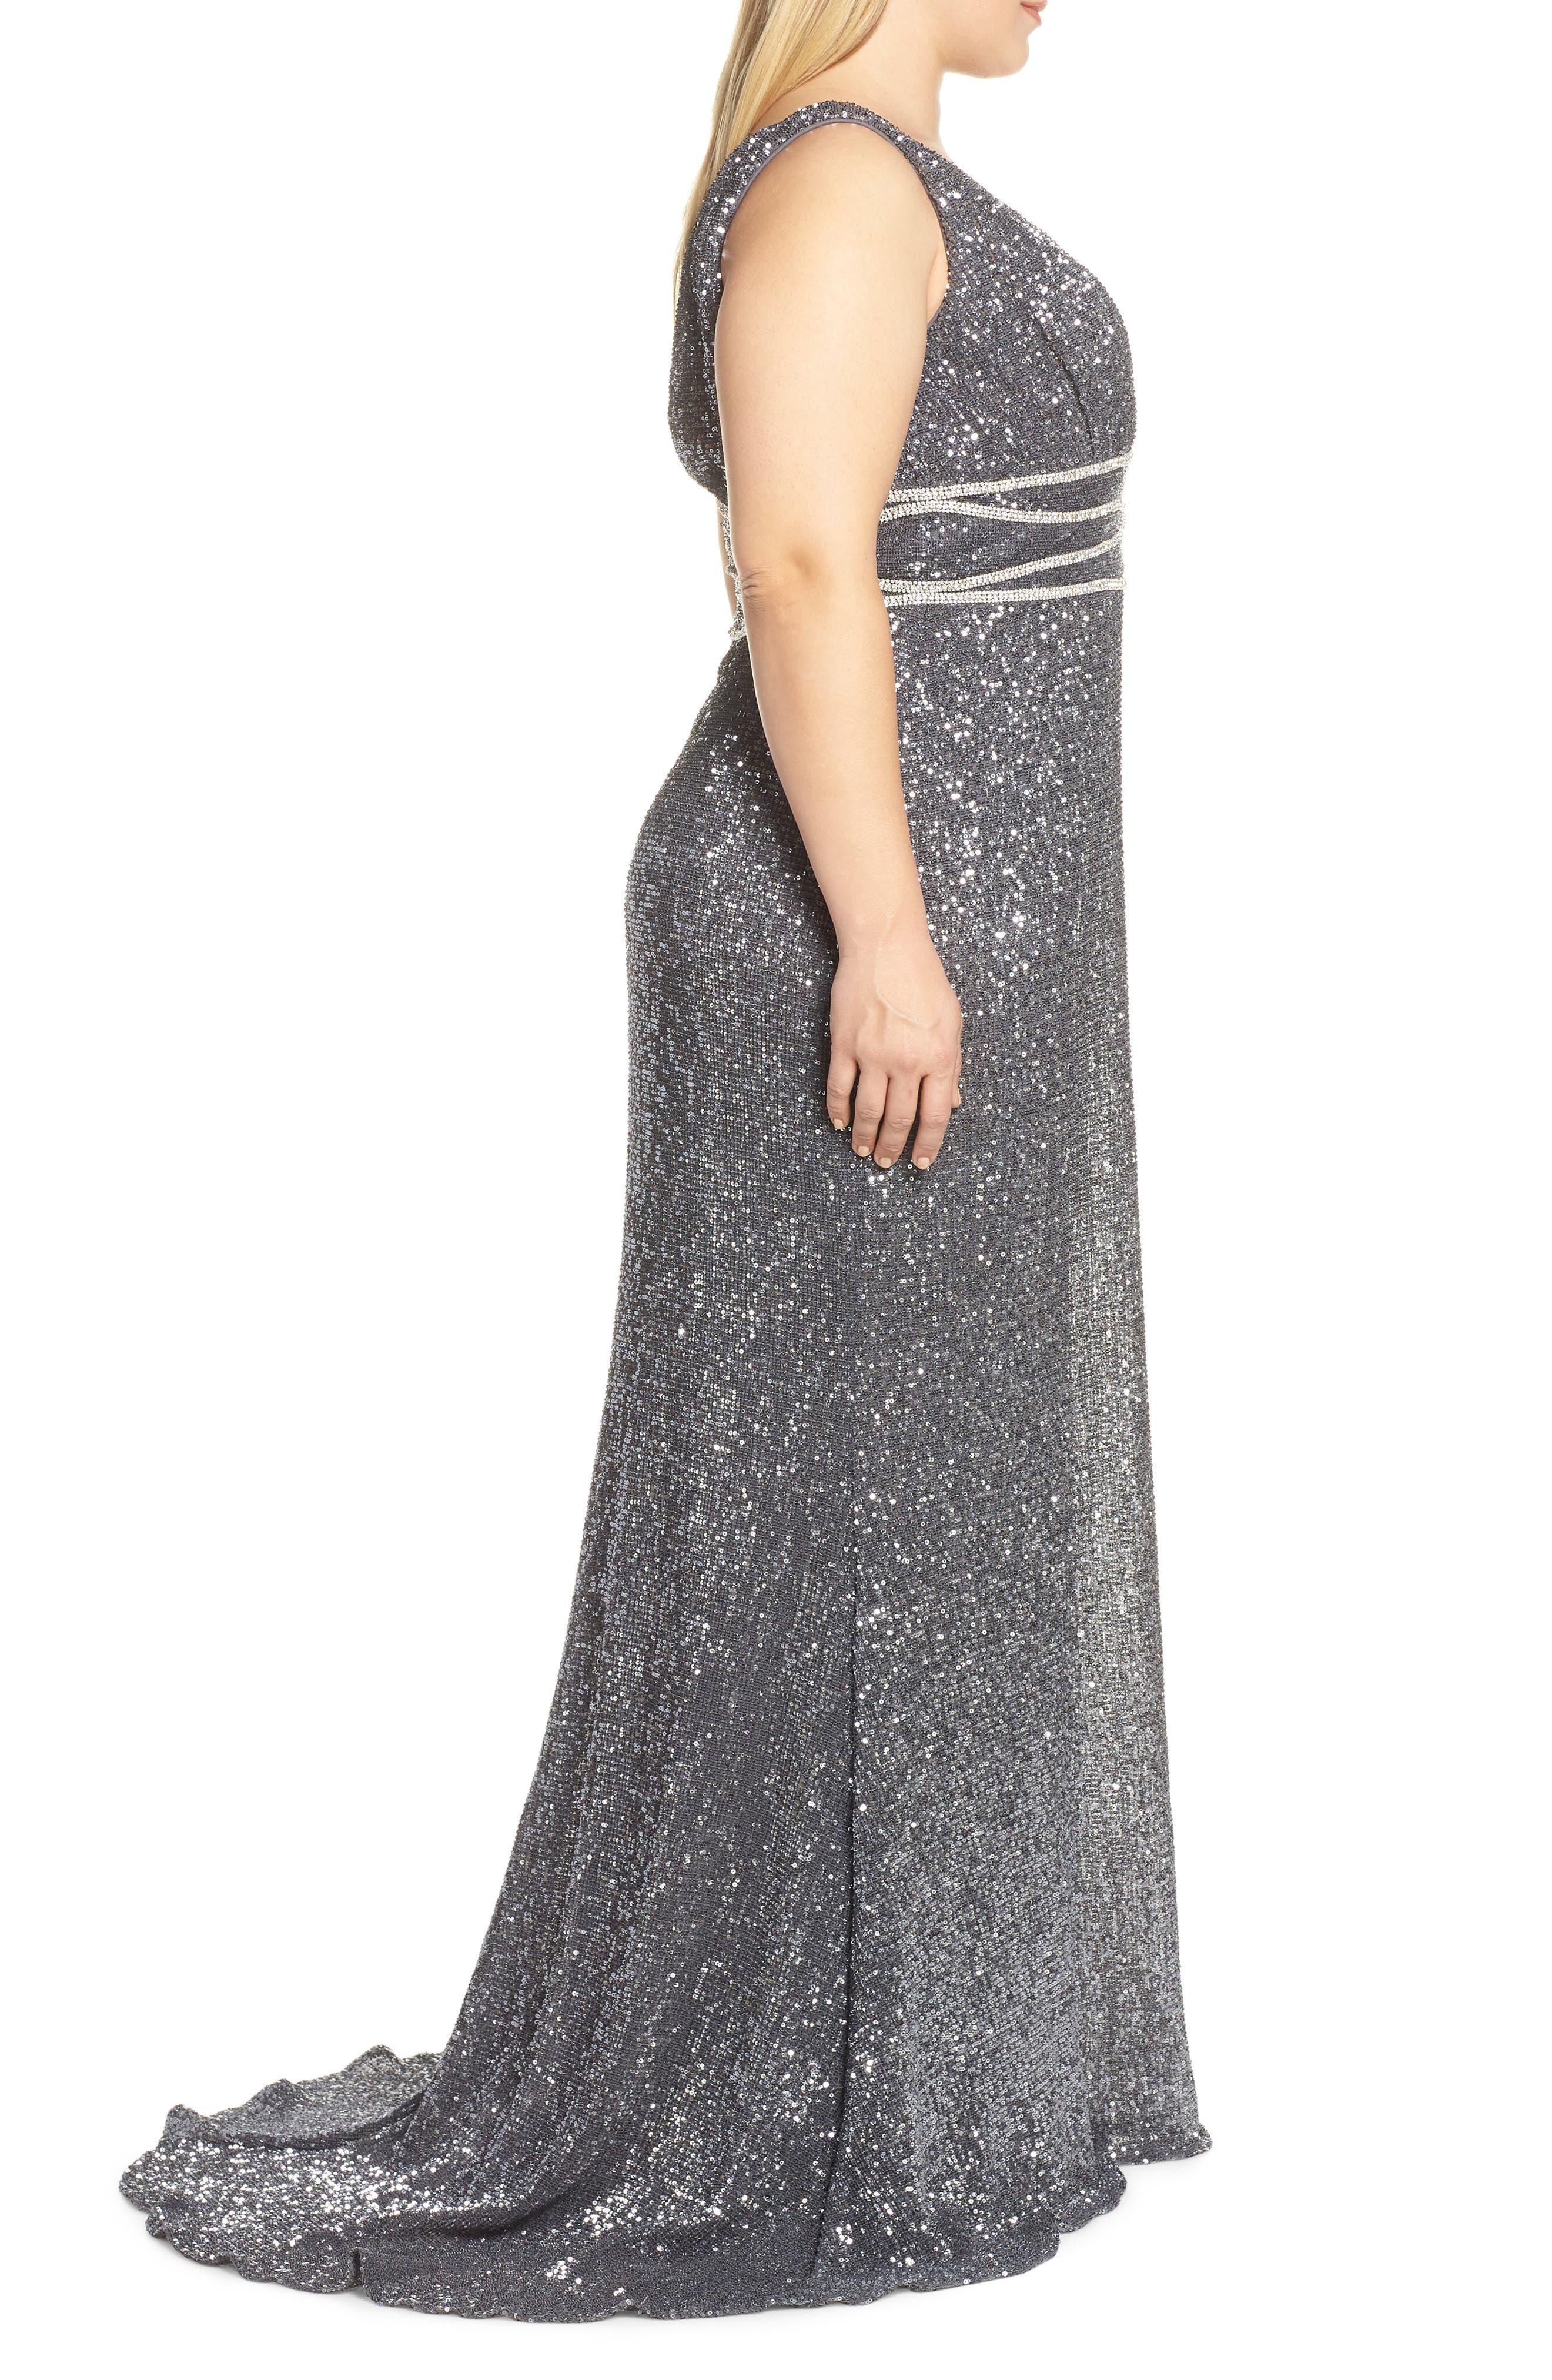 MAC DUGGAL, Beaded Waist Sequin Evening Dress, Alternate thumbnail 4, color, CHARCOAL